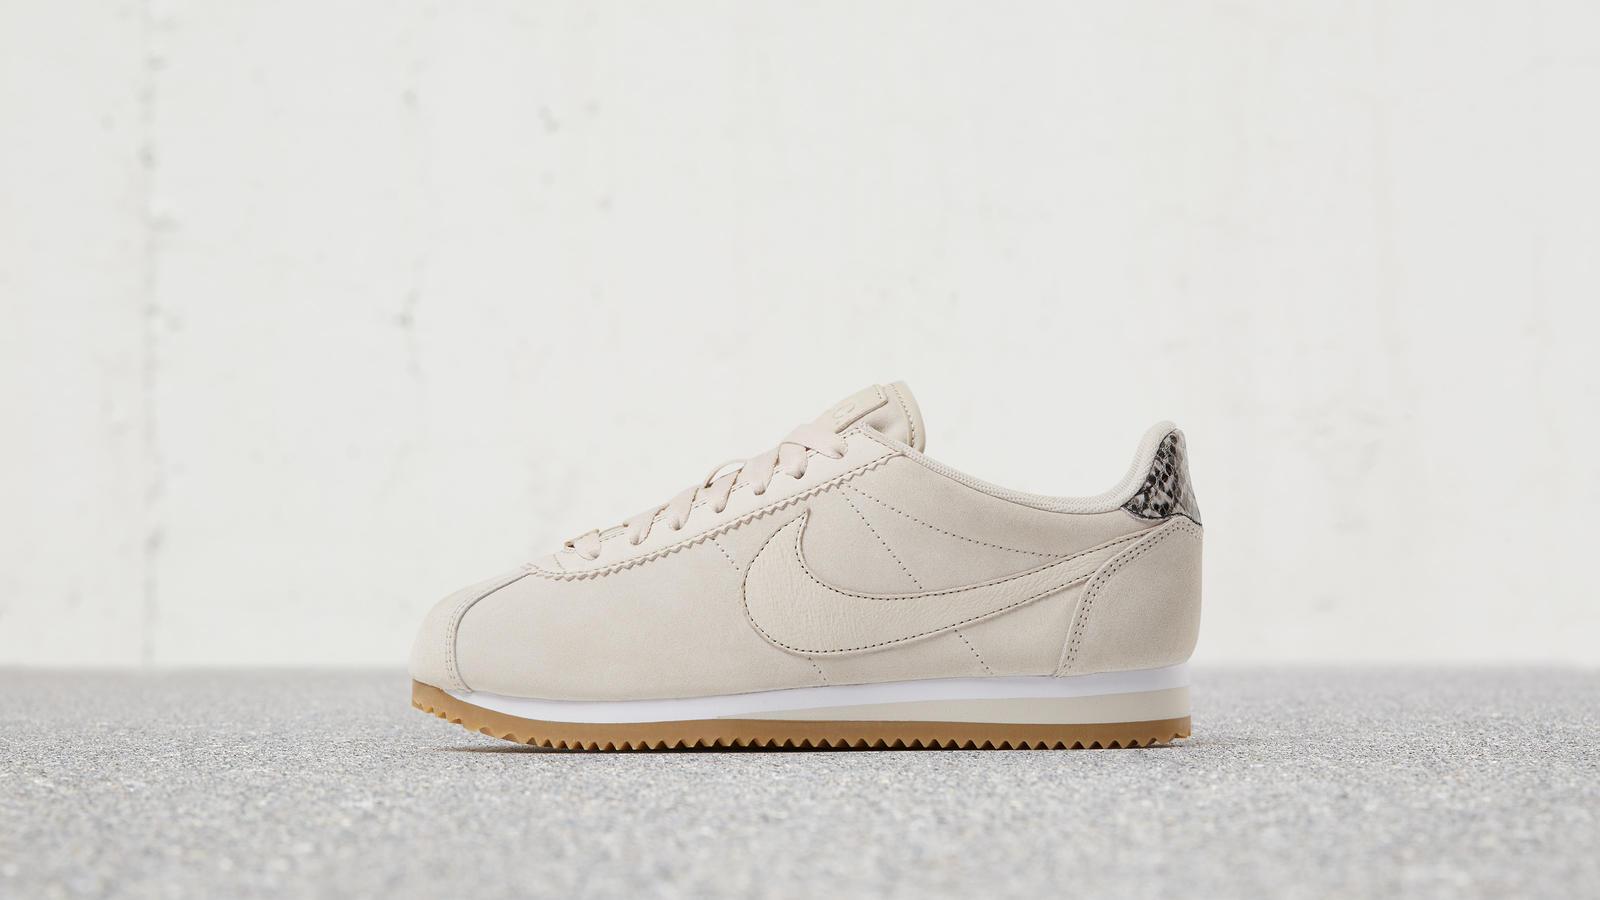 Nike Cortez Classic LX x A.L.C. 0